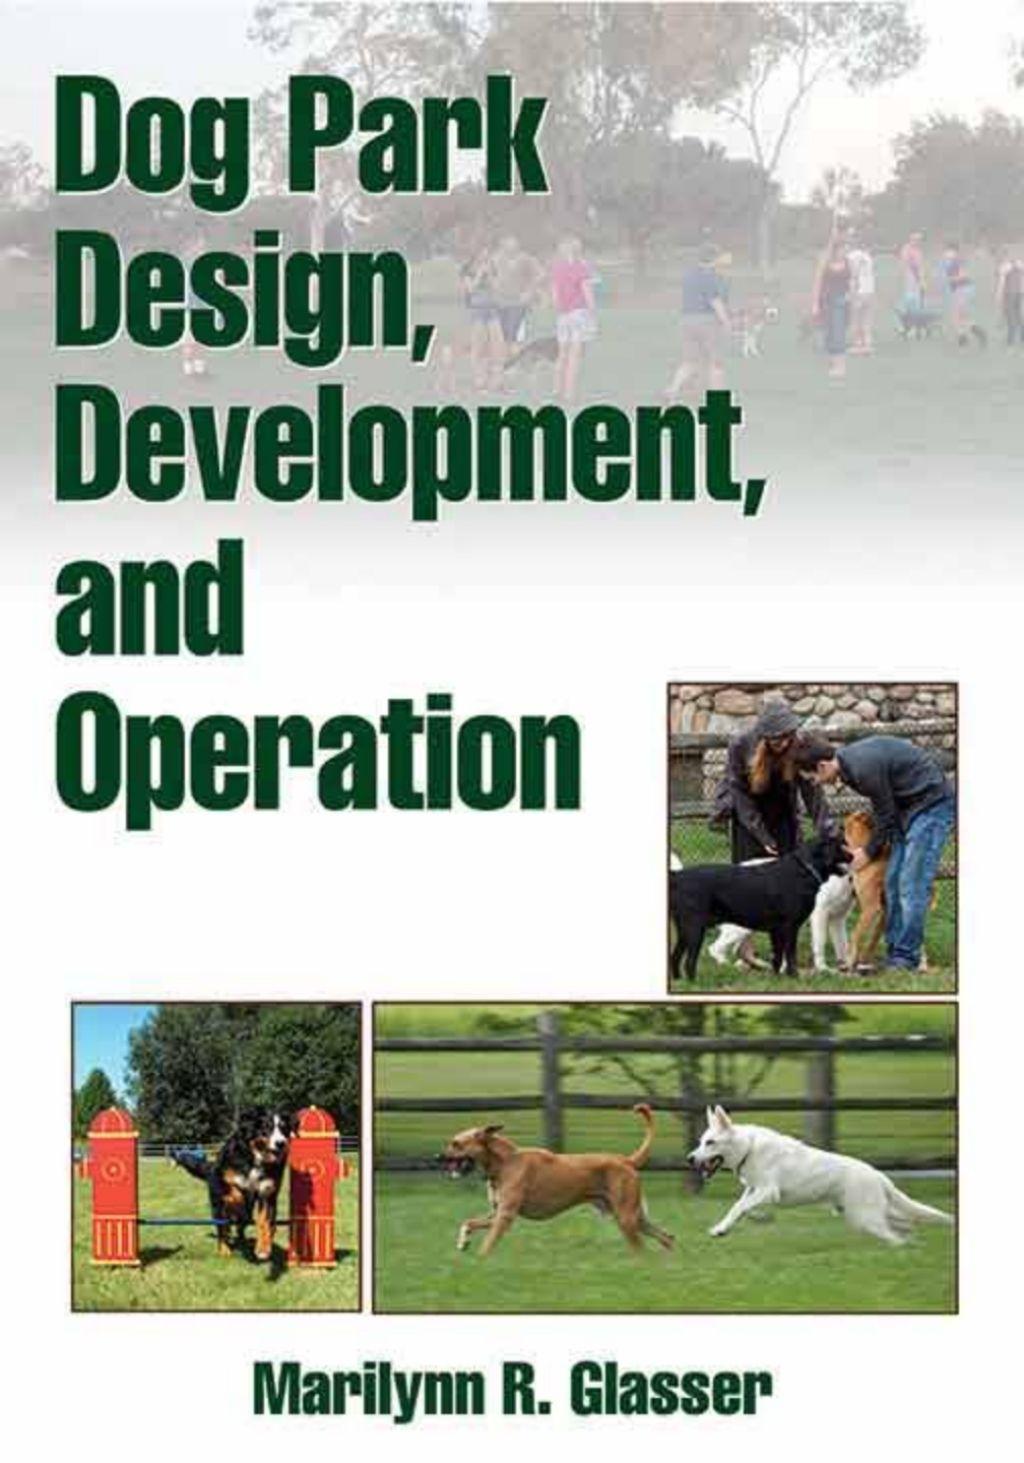 Dog Park Design Development And Operation Ebook Dog Park